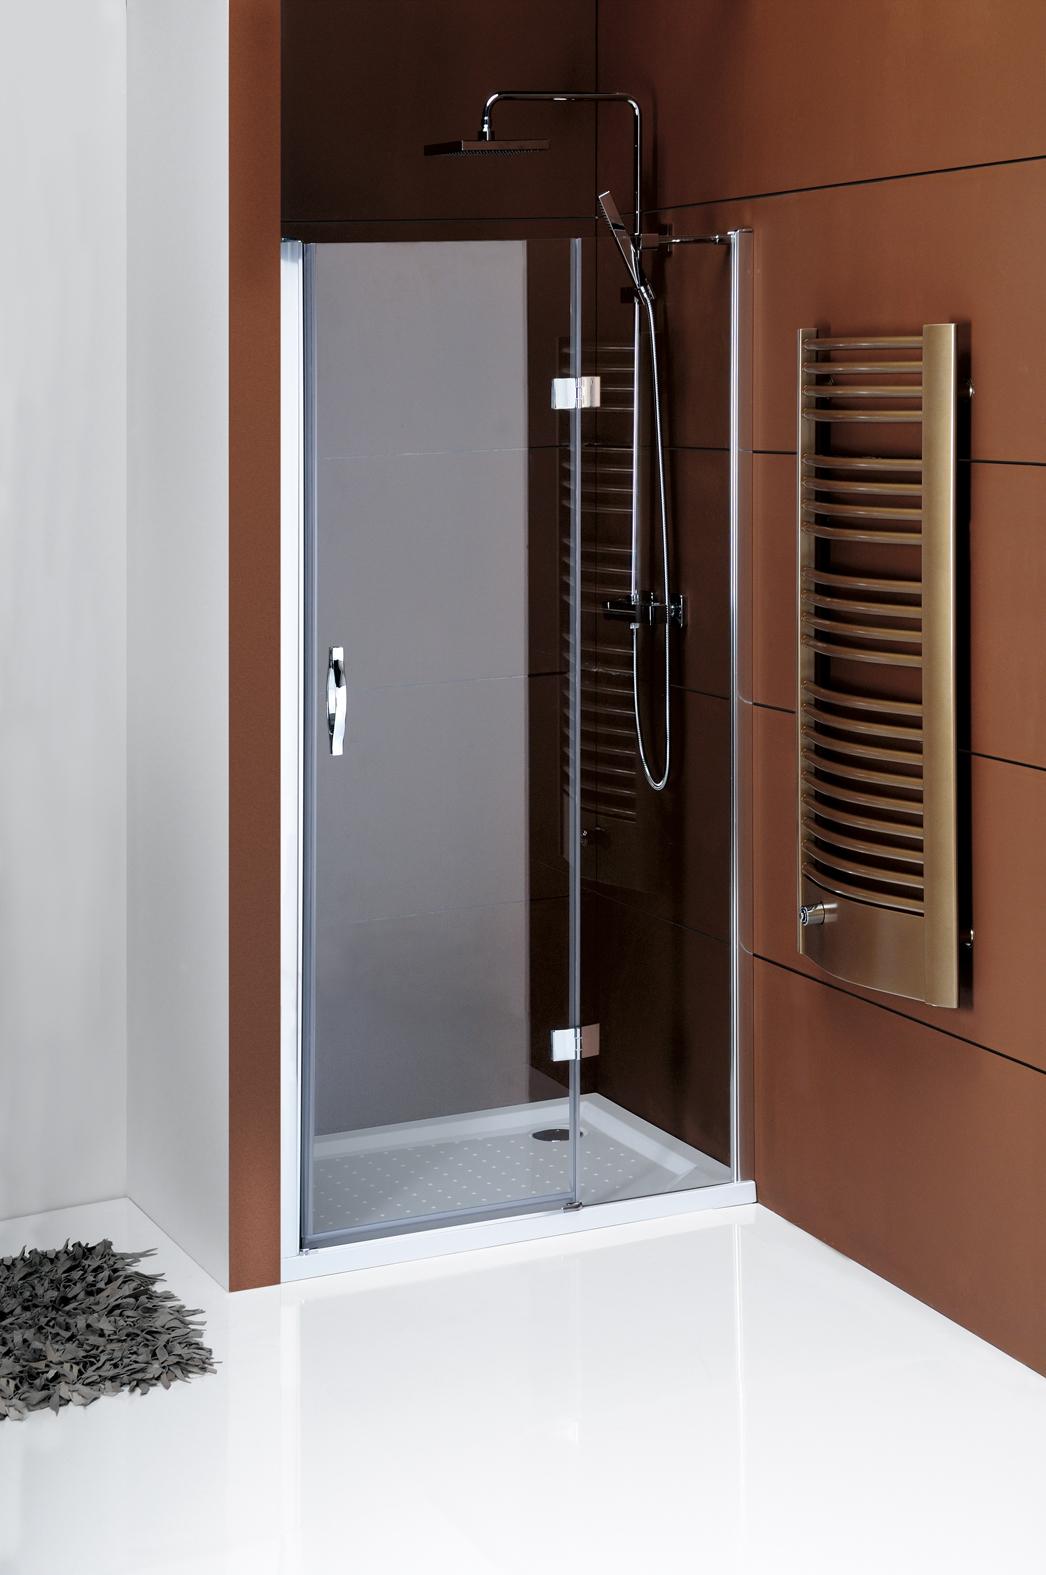 Gelco Sprchové dveře Legro do niky jednodílné otočné 90 cm, sklo čiré/leštěný profil GL1290